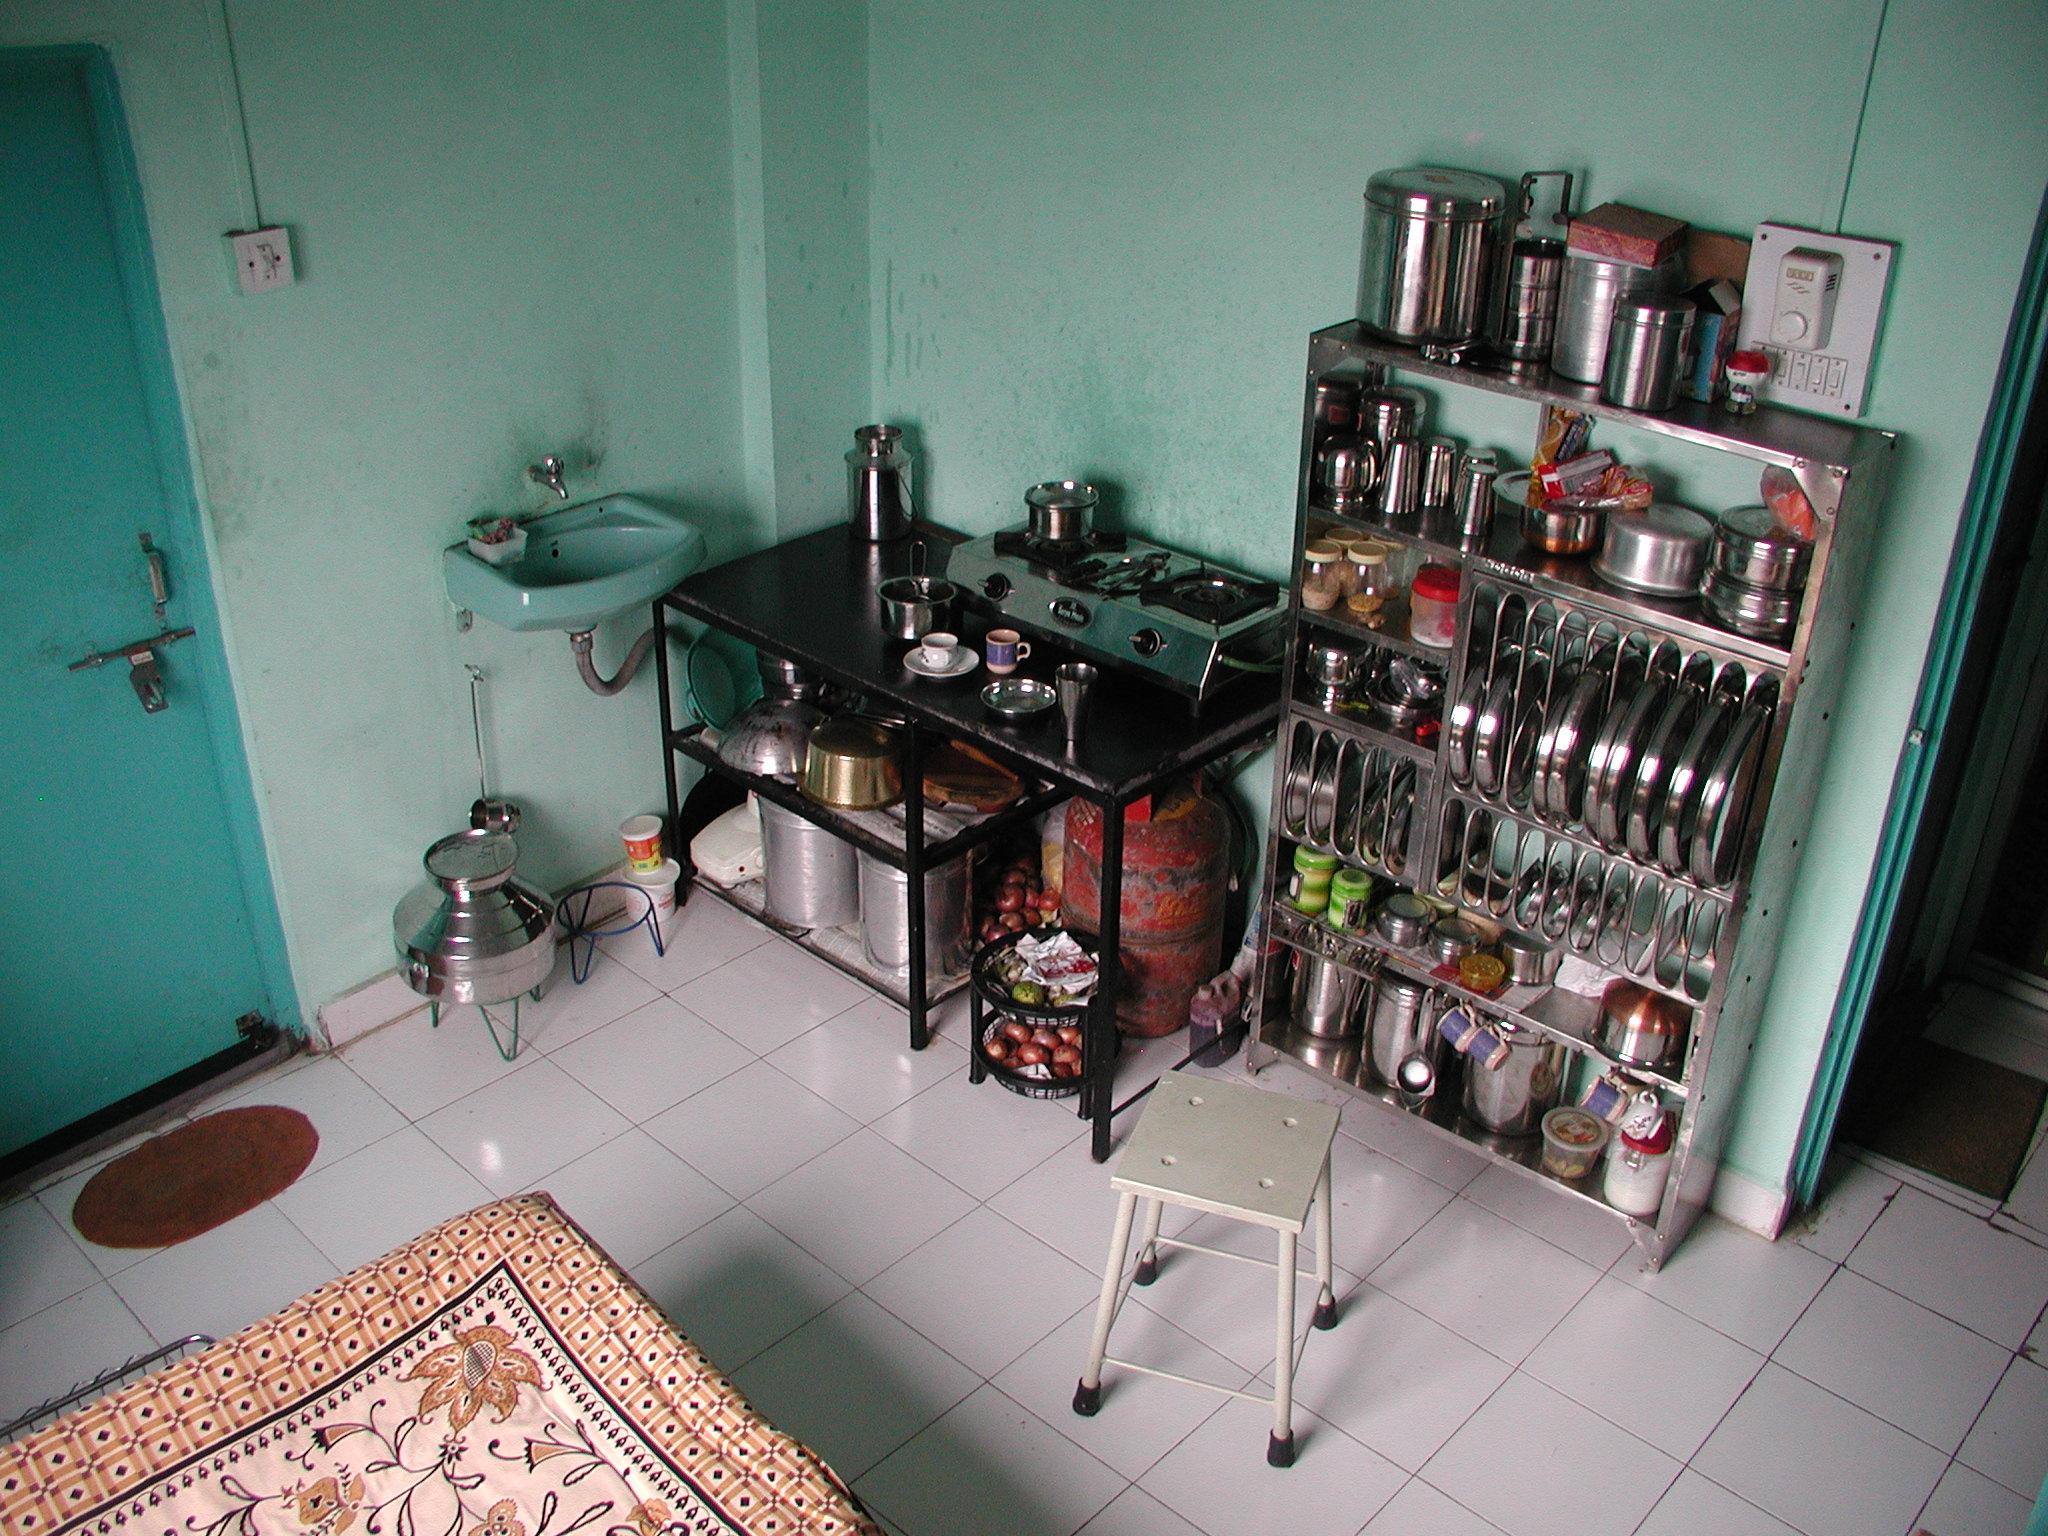 fileindian cuisine in householdjpg wikimedia commons